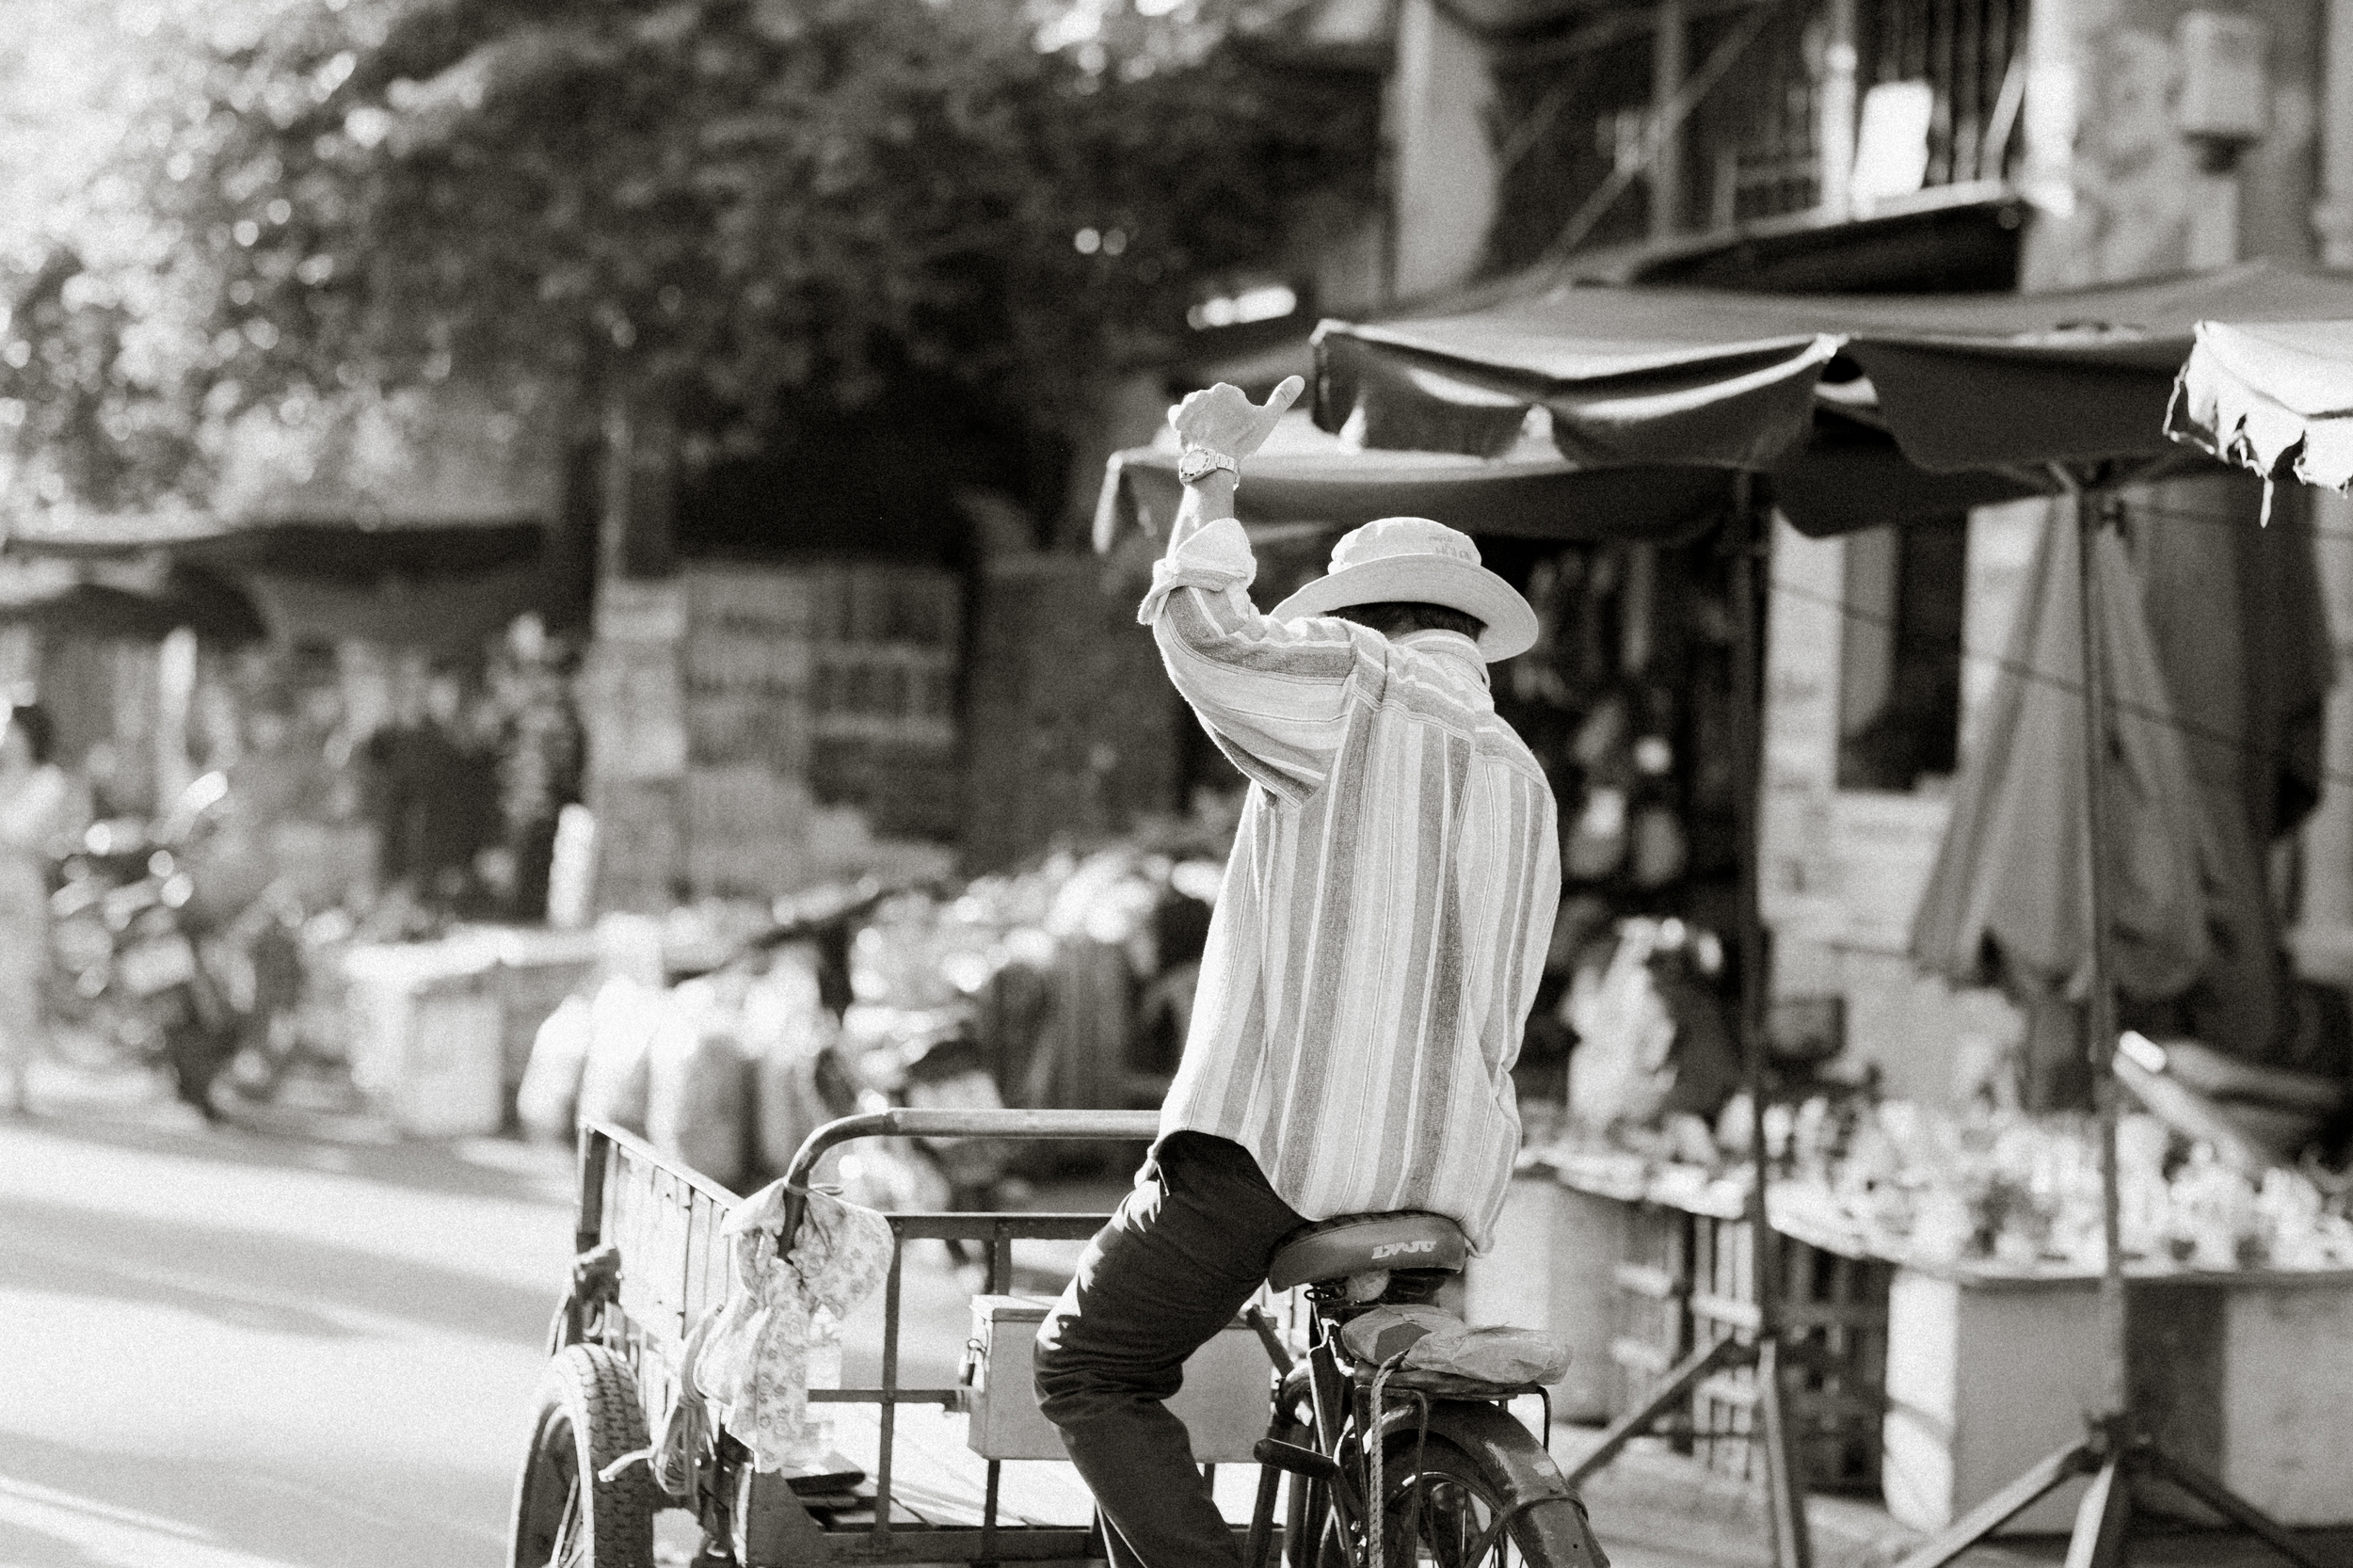 Cari Zhu Photography - Hoi An Vietnam South East Asia Travel-9966.jpg